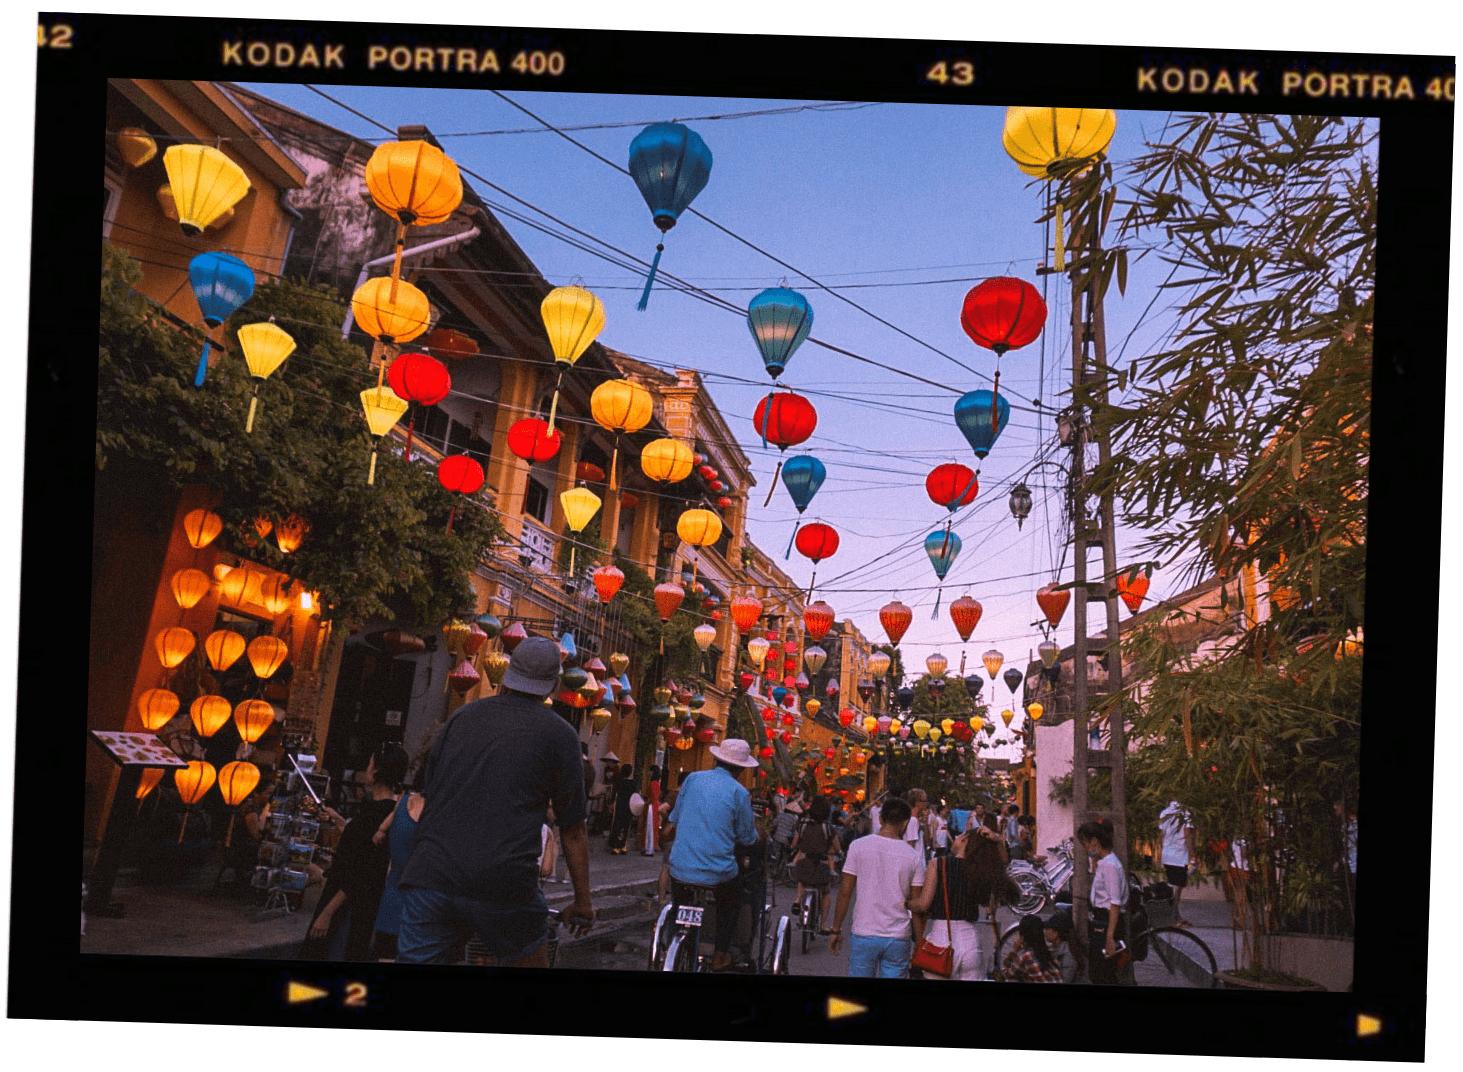 hoi an wanderlist best things to do vietnam lanterns old town